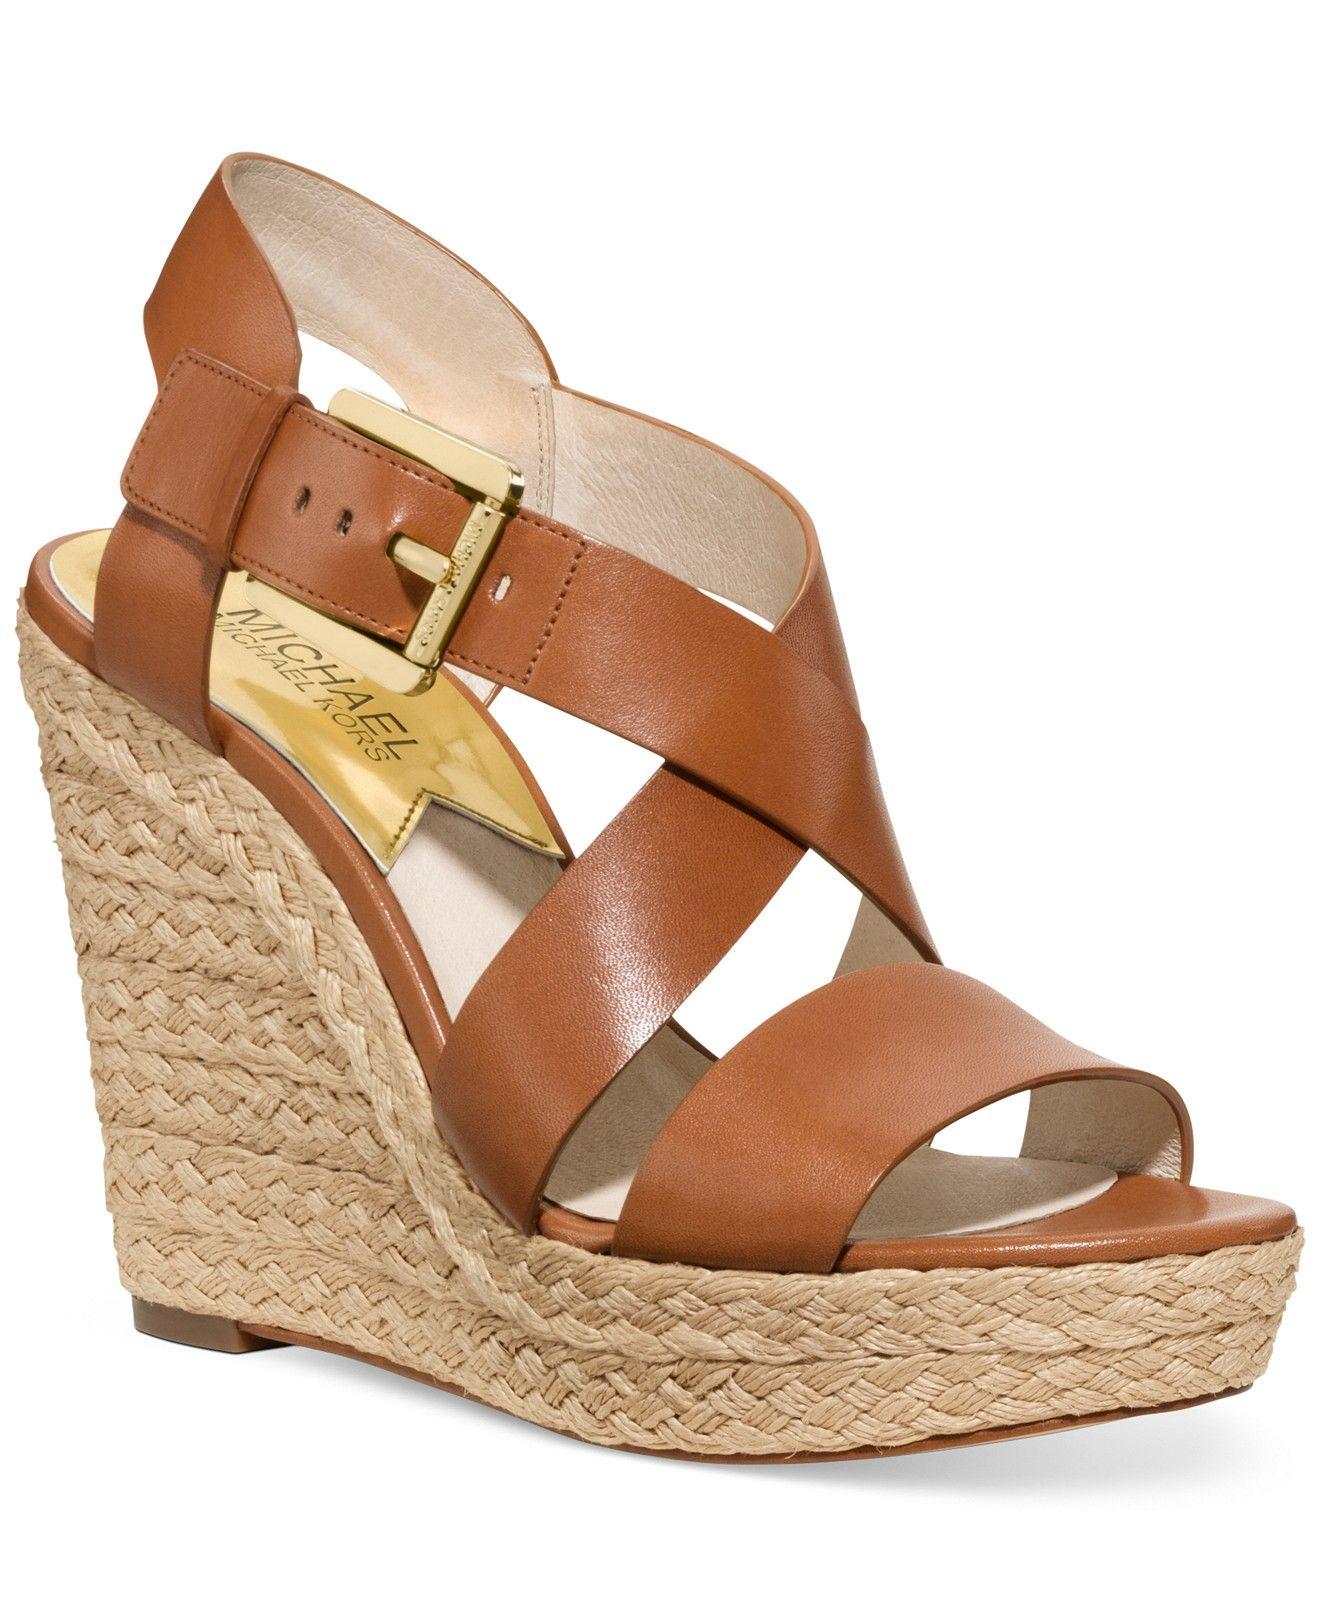 MICHAEL Michael Kors Giovanna Platform Wedge Sandals - All Women's Shoes -  Shoes - Macy's - MICHAEL Michael Kors Damita Wedges Wedges Pinterest Michael